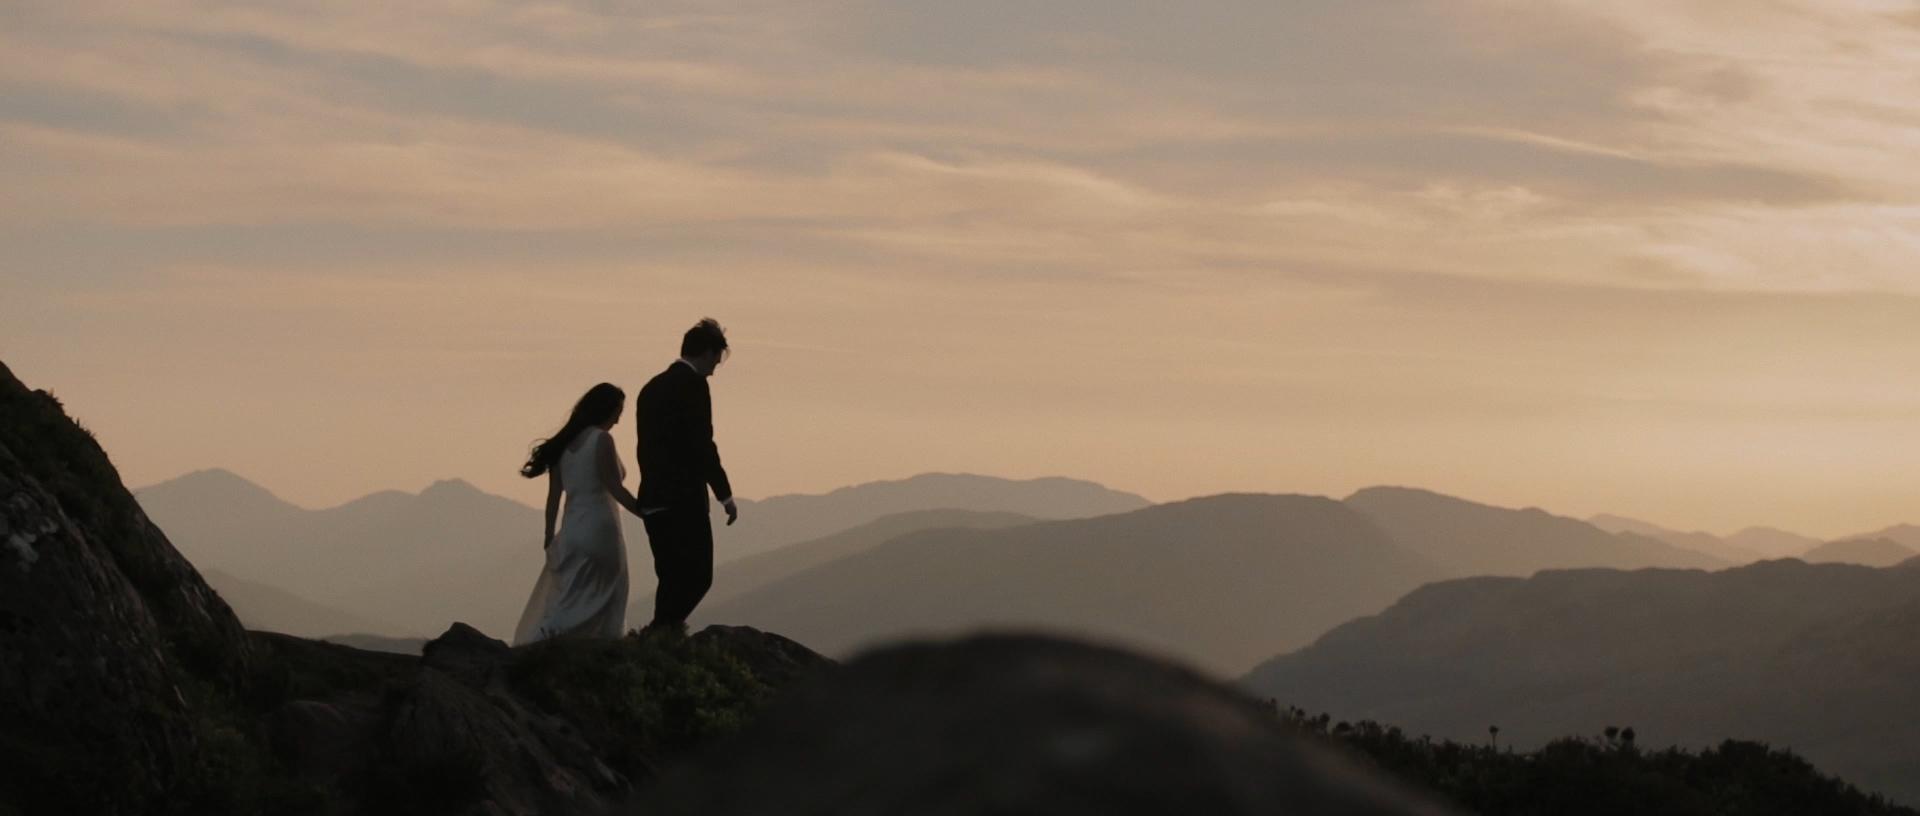 pratis-farm-wedding-videographer_LL_01.jpg